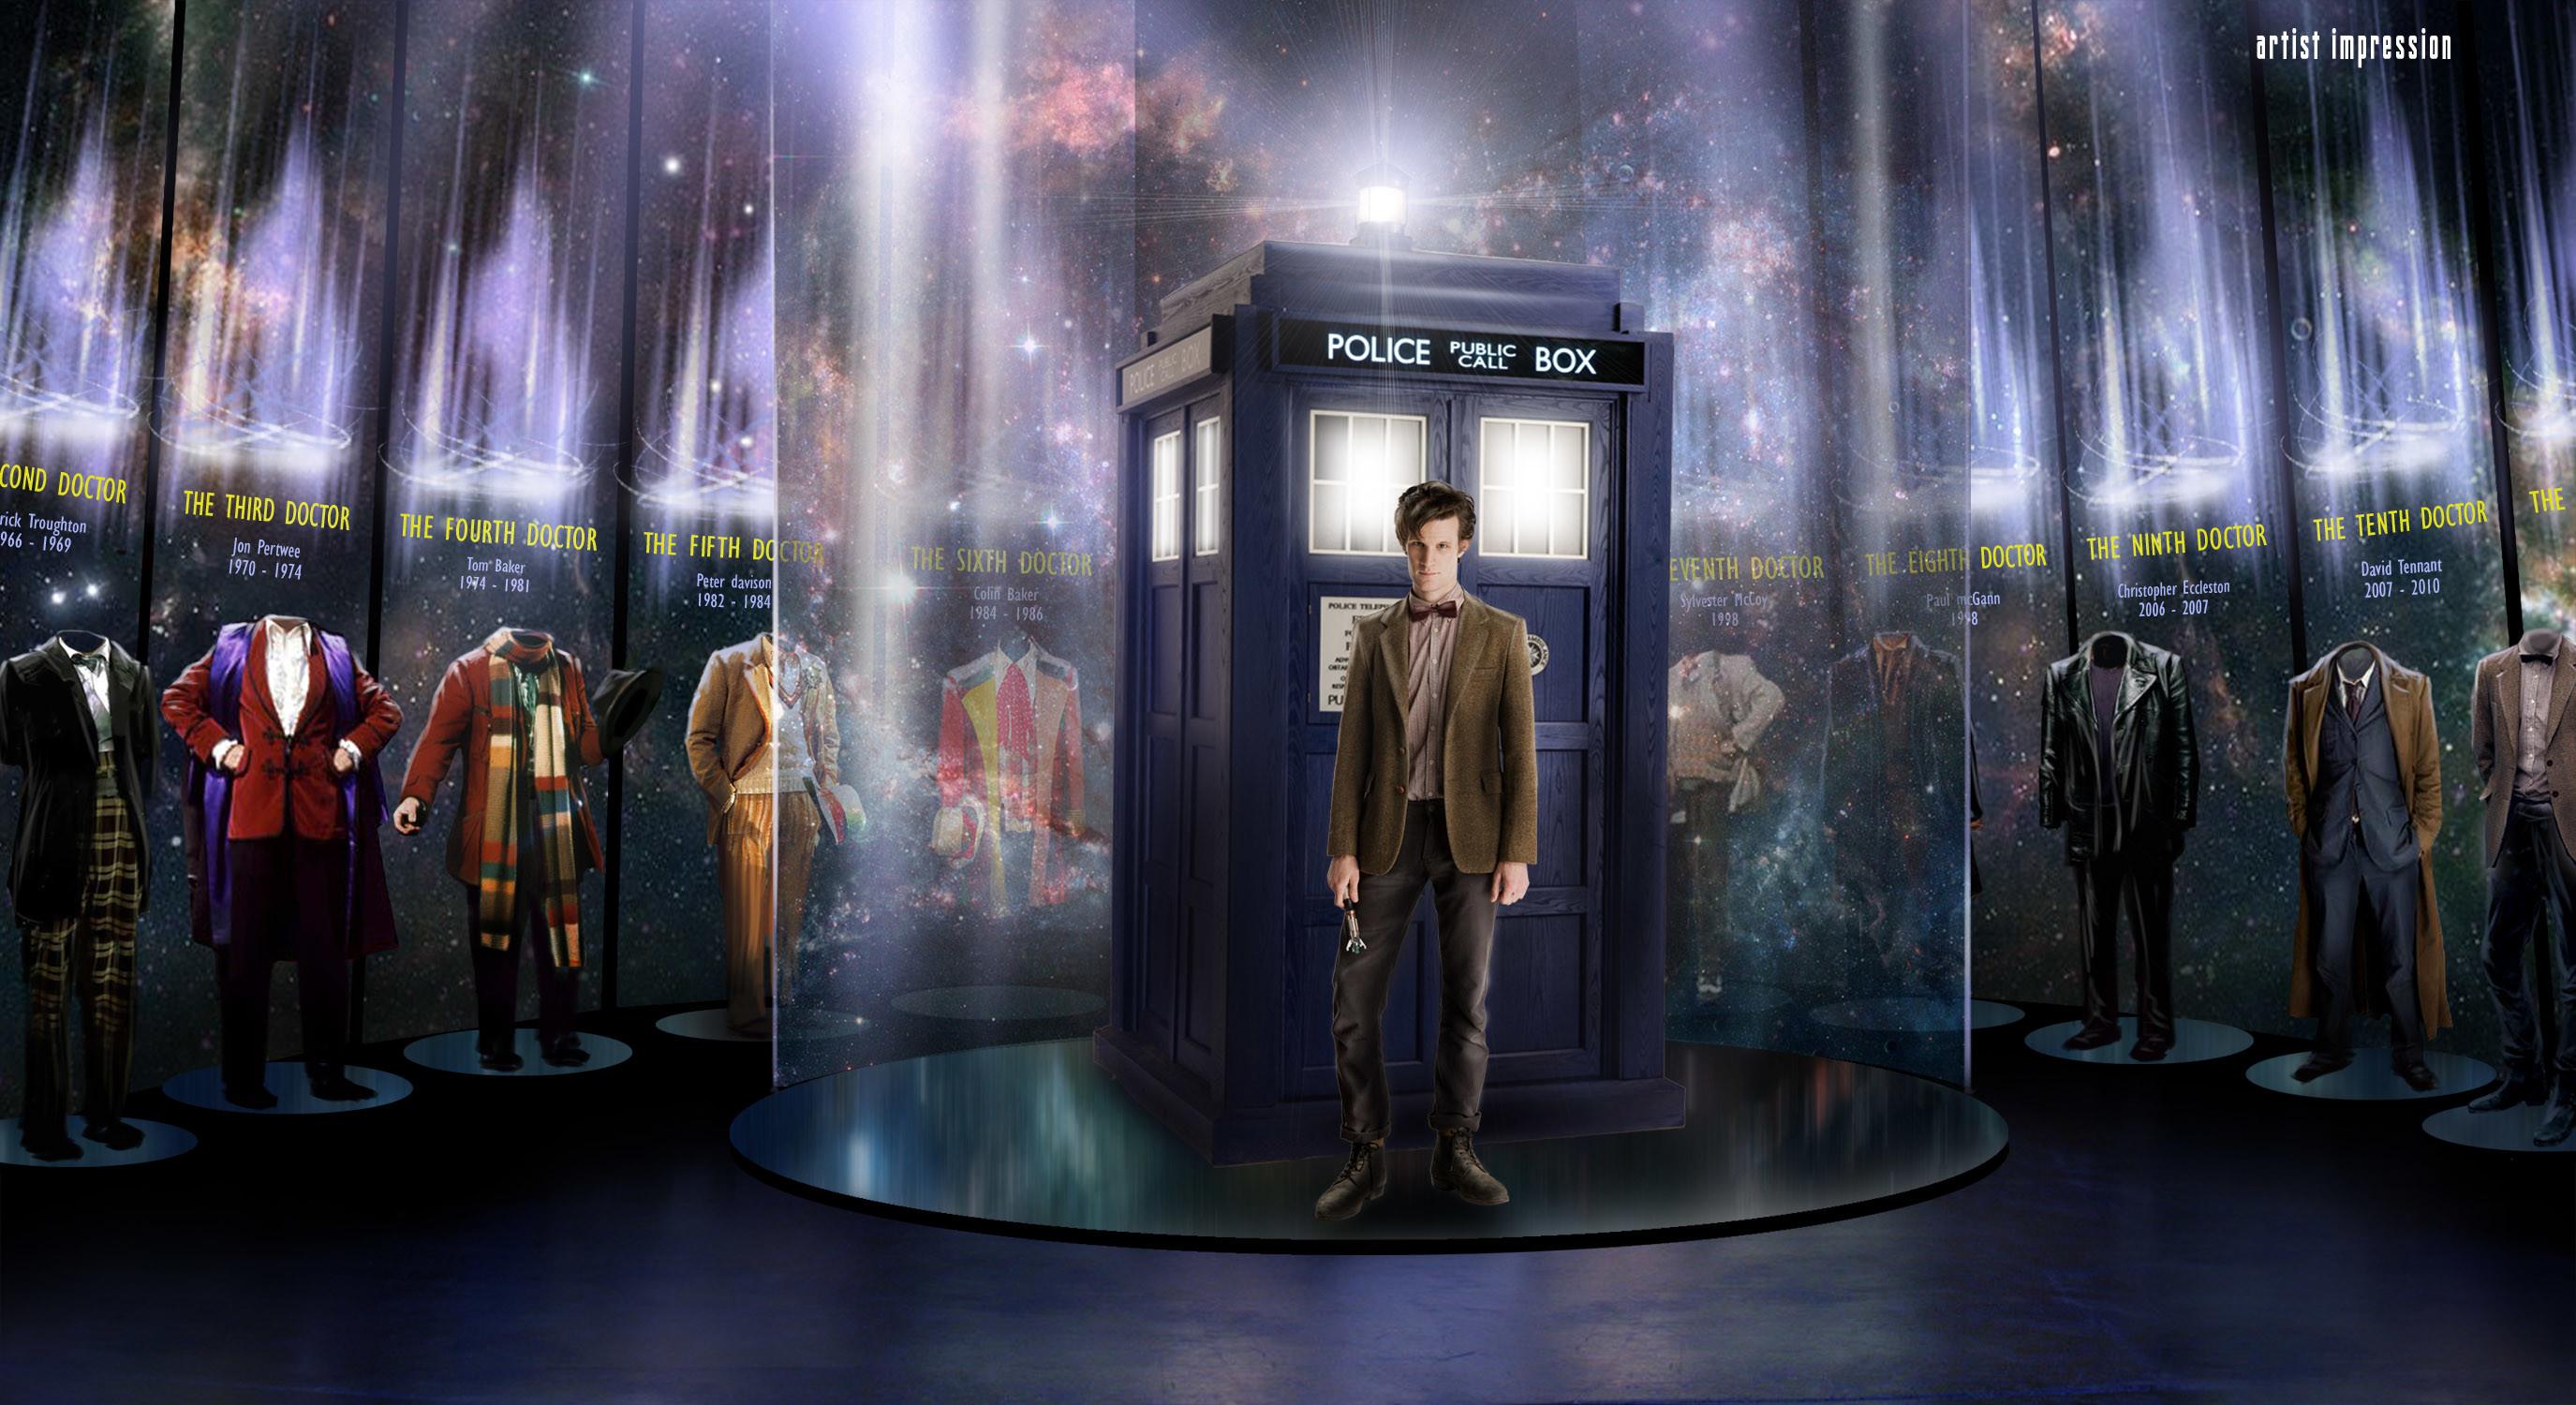 matt smith karen gillan amy pond eleventh doctor doctor who   HD Wallpapers    Pinterest   Matt smith, Hd wallpaper and Wallpaper